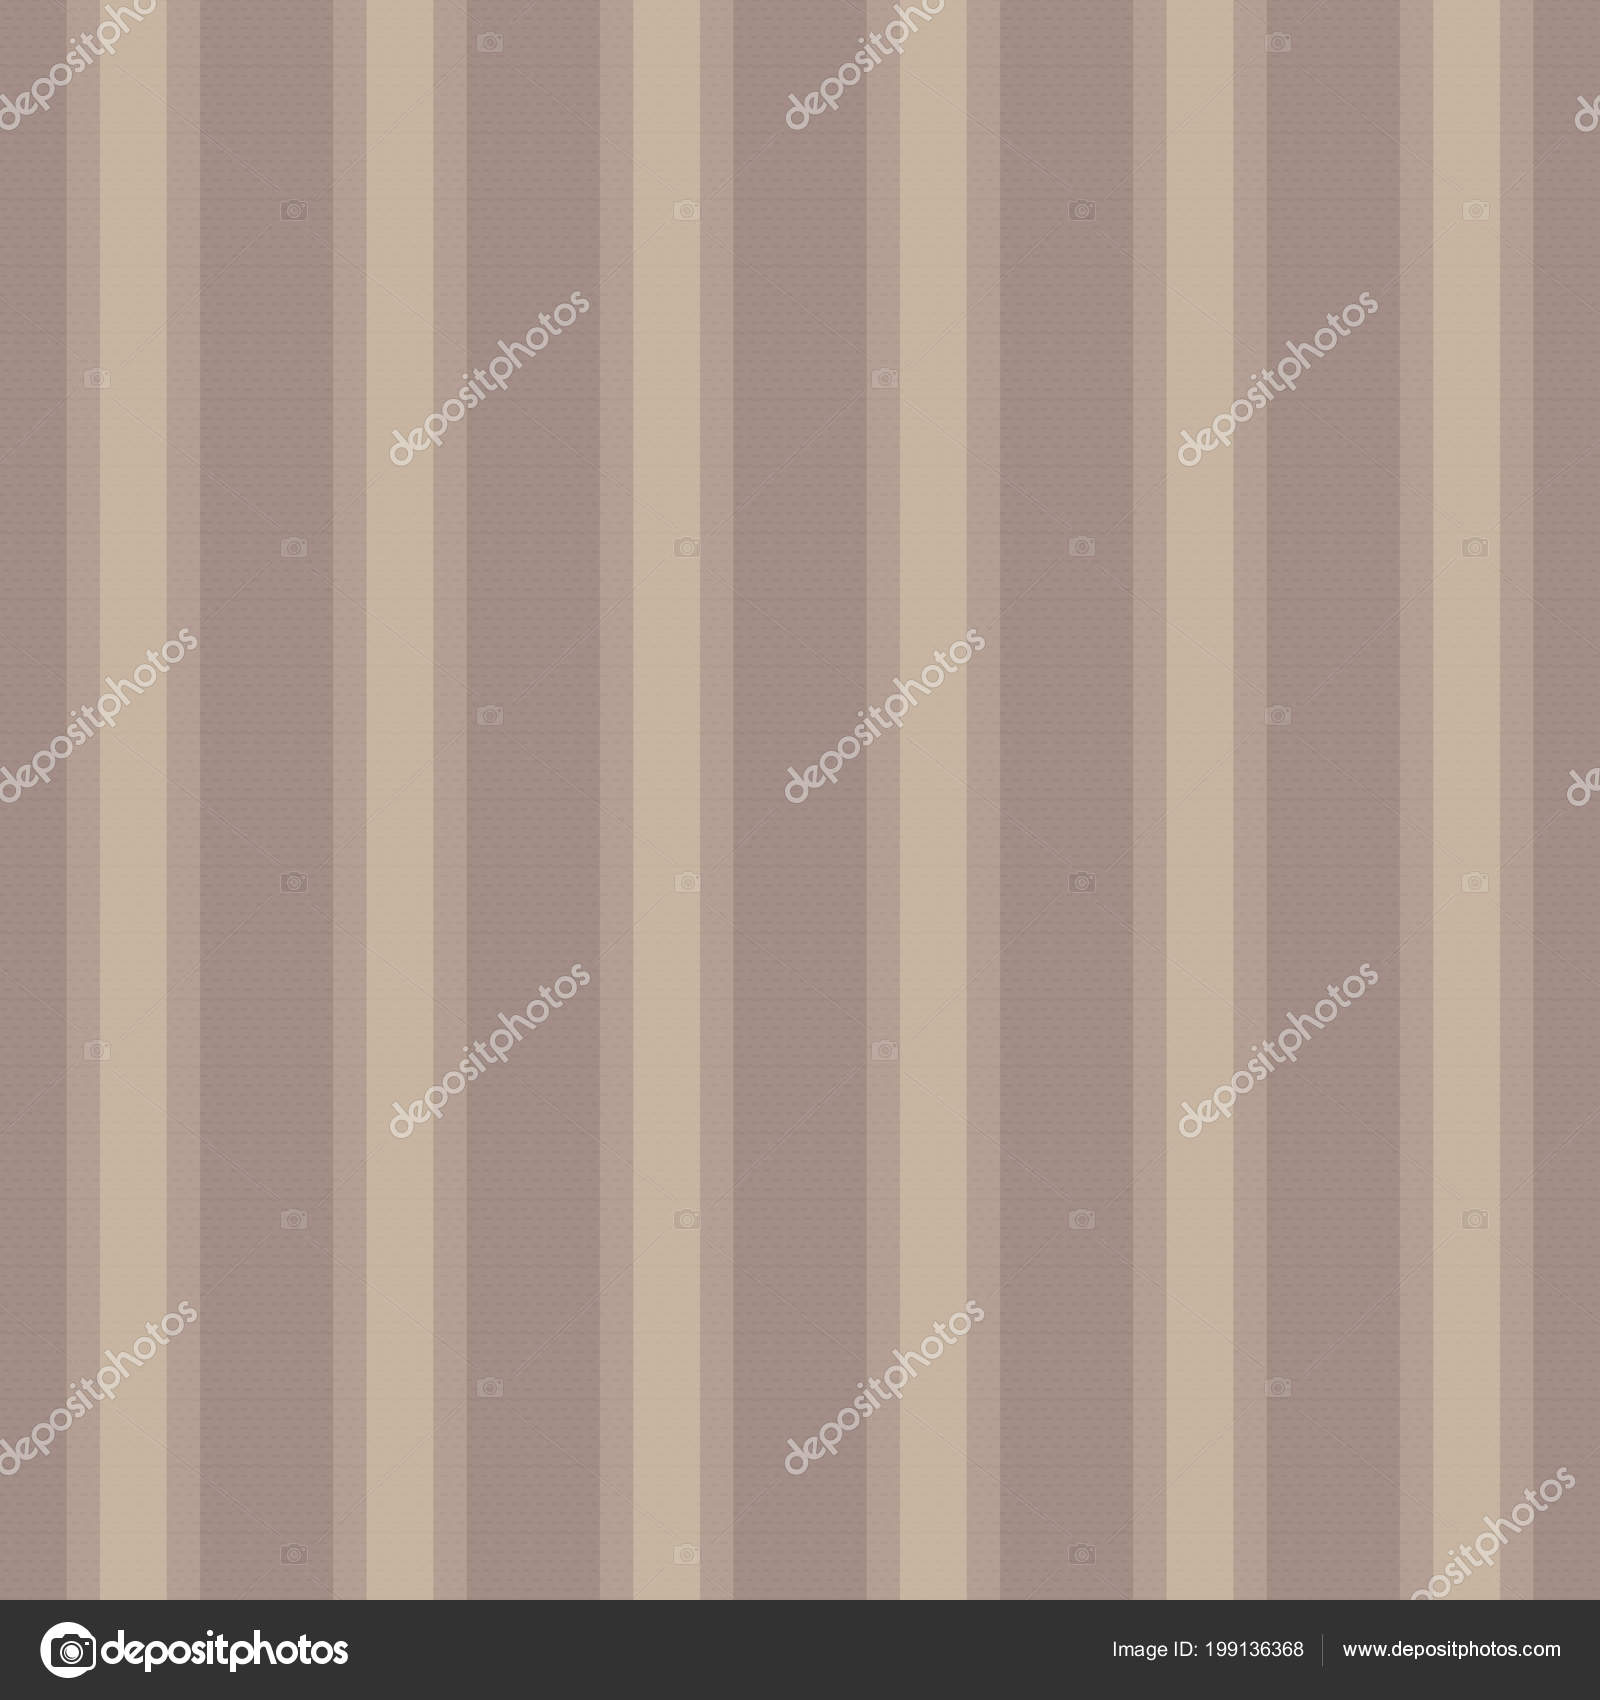 Brown Light Dark Coffee Color Striped Vertical Retro Vintage Wallpaper  Patterned Paper Texture Mats Linen Burlap Rubbing Vector Seamless Pattern  Background ...